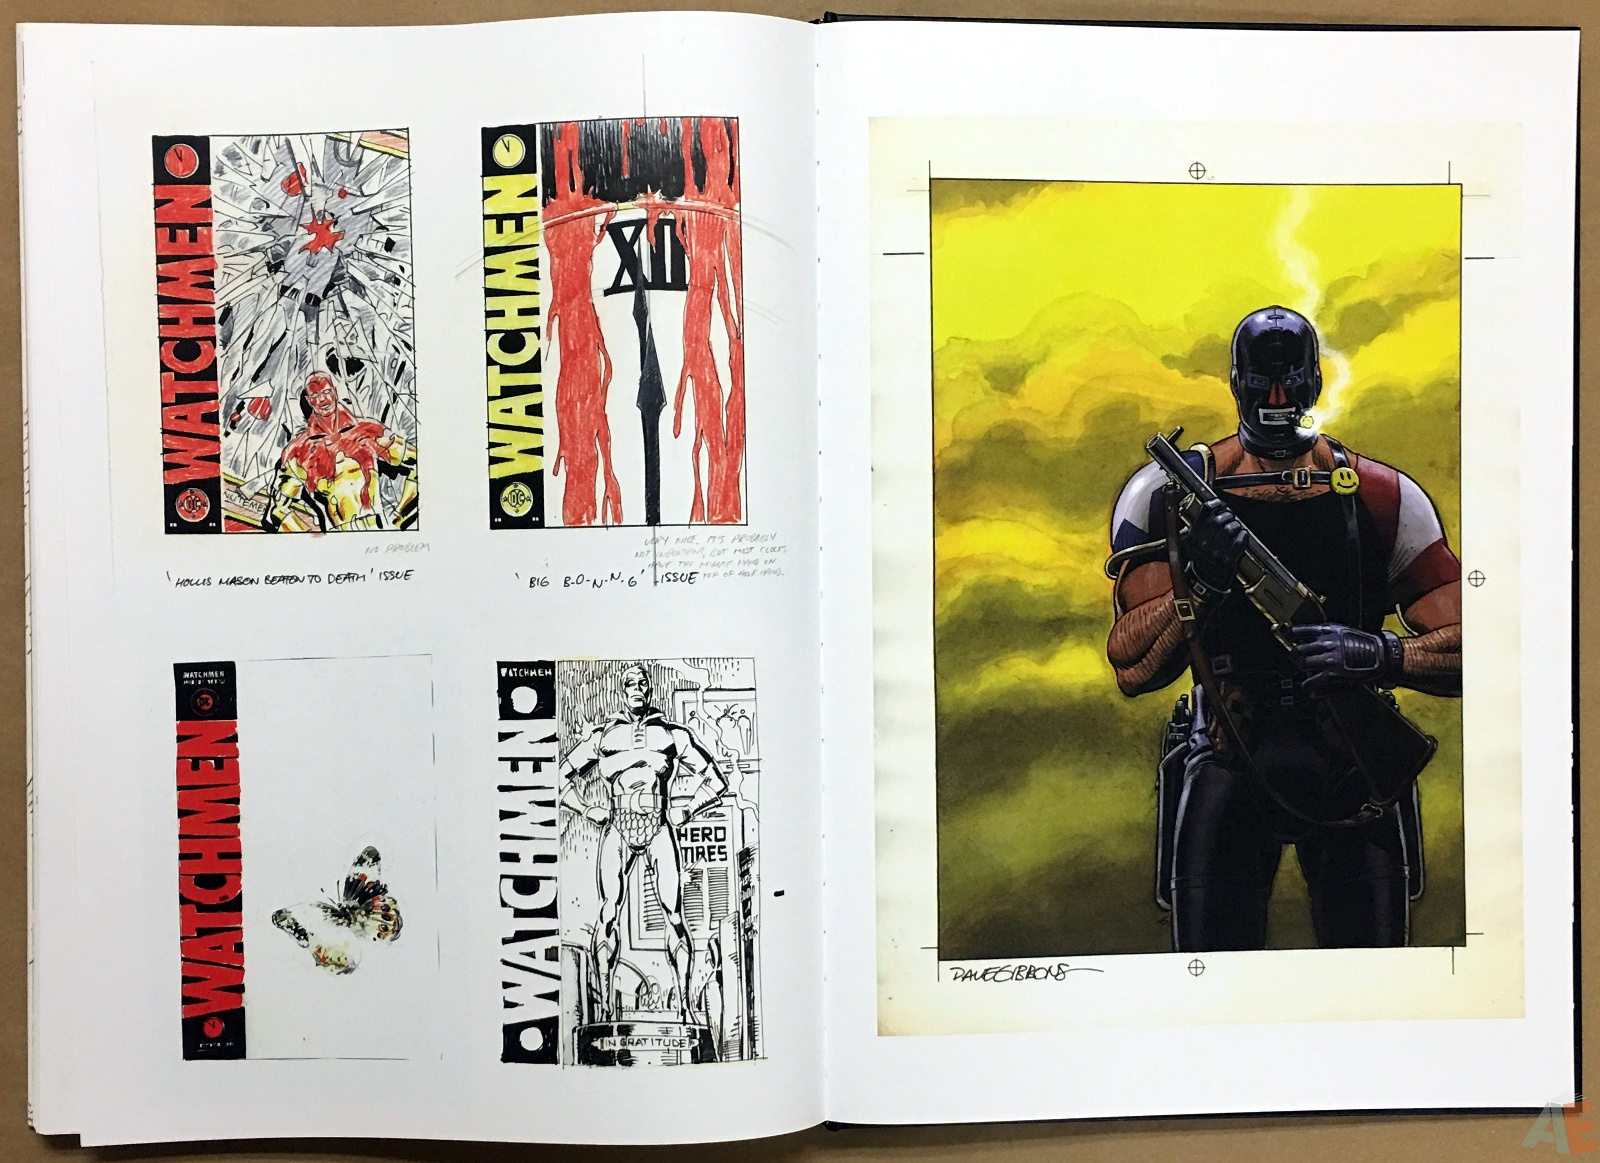 Dave Gibbons Watchmen Artifact Edition 48